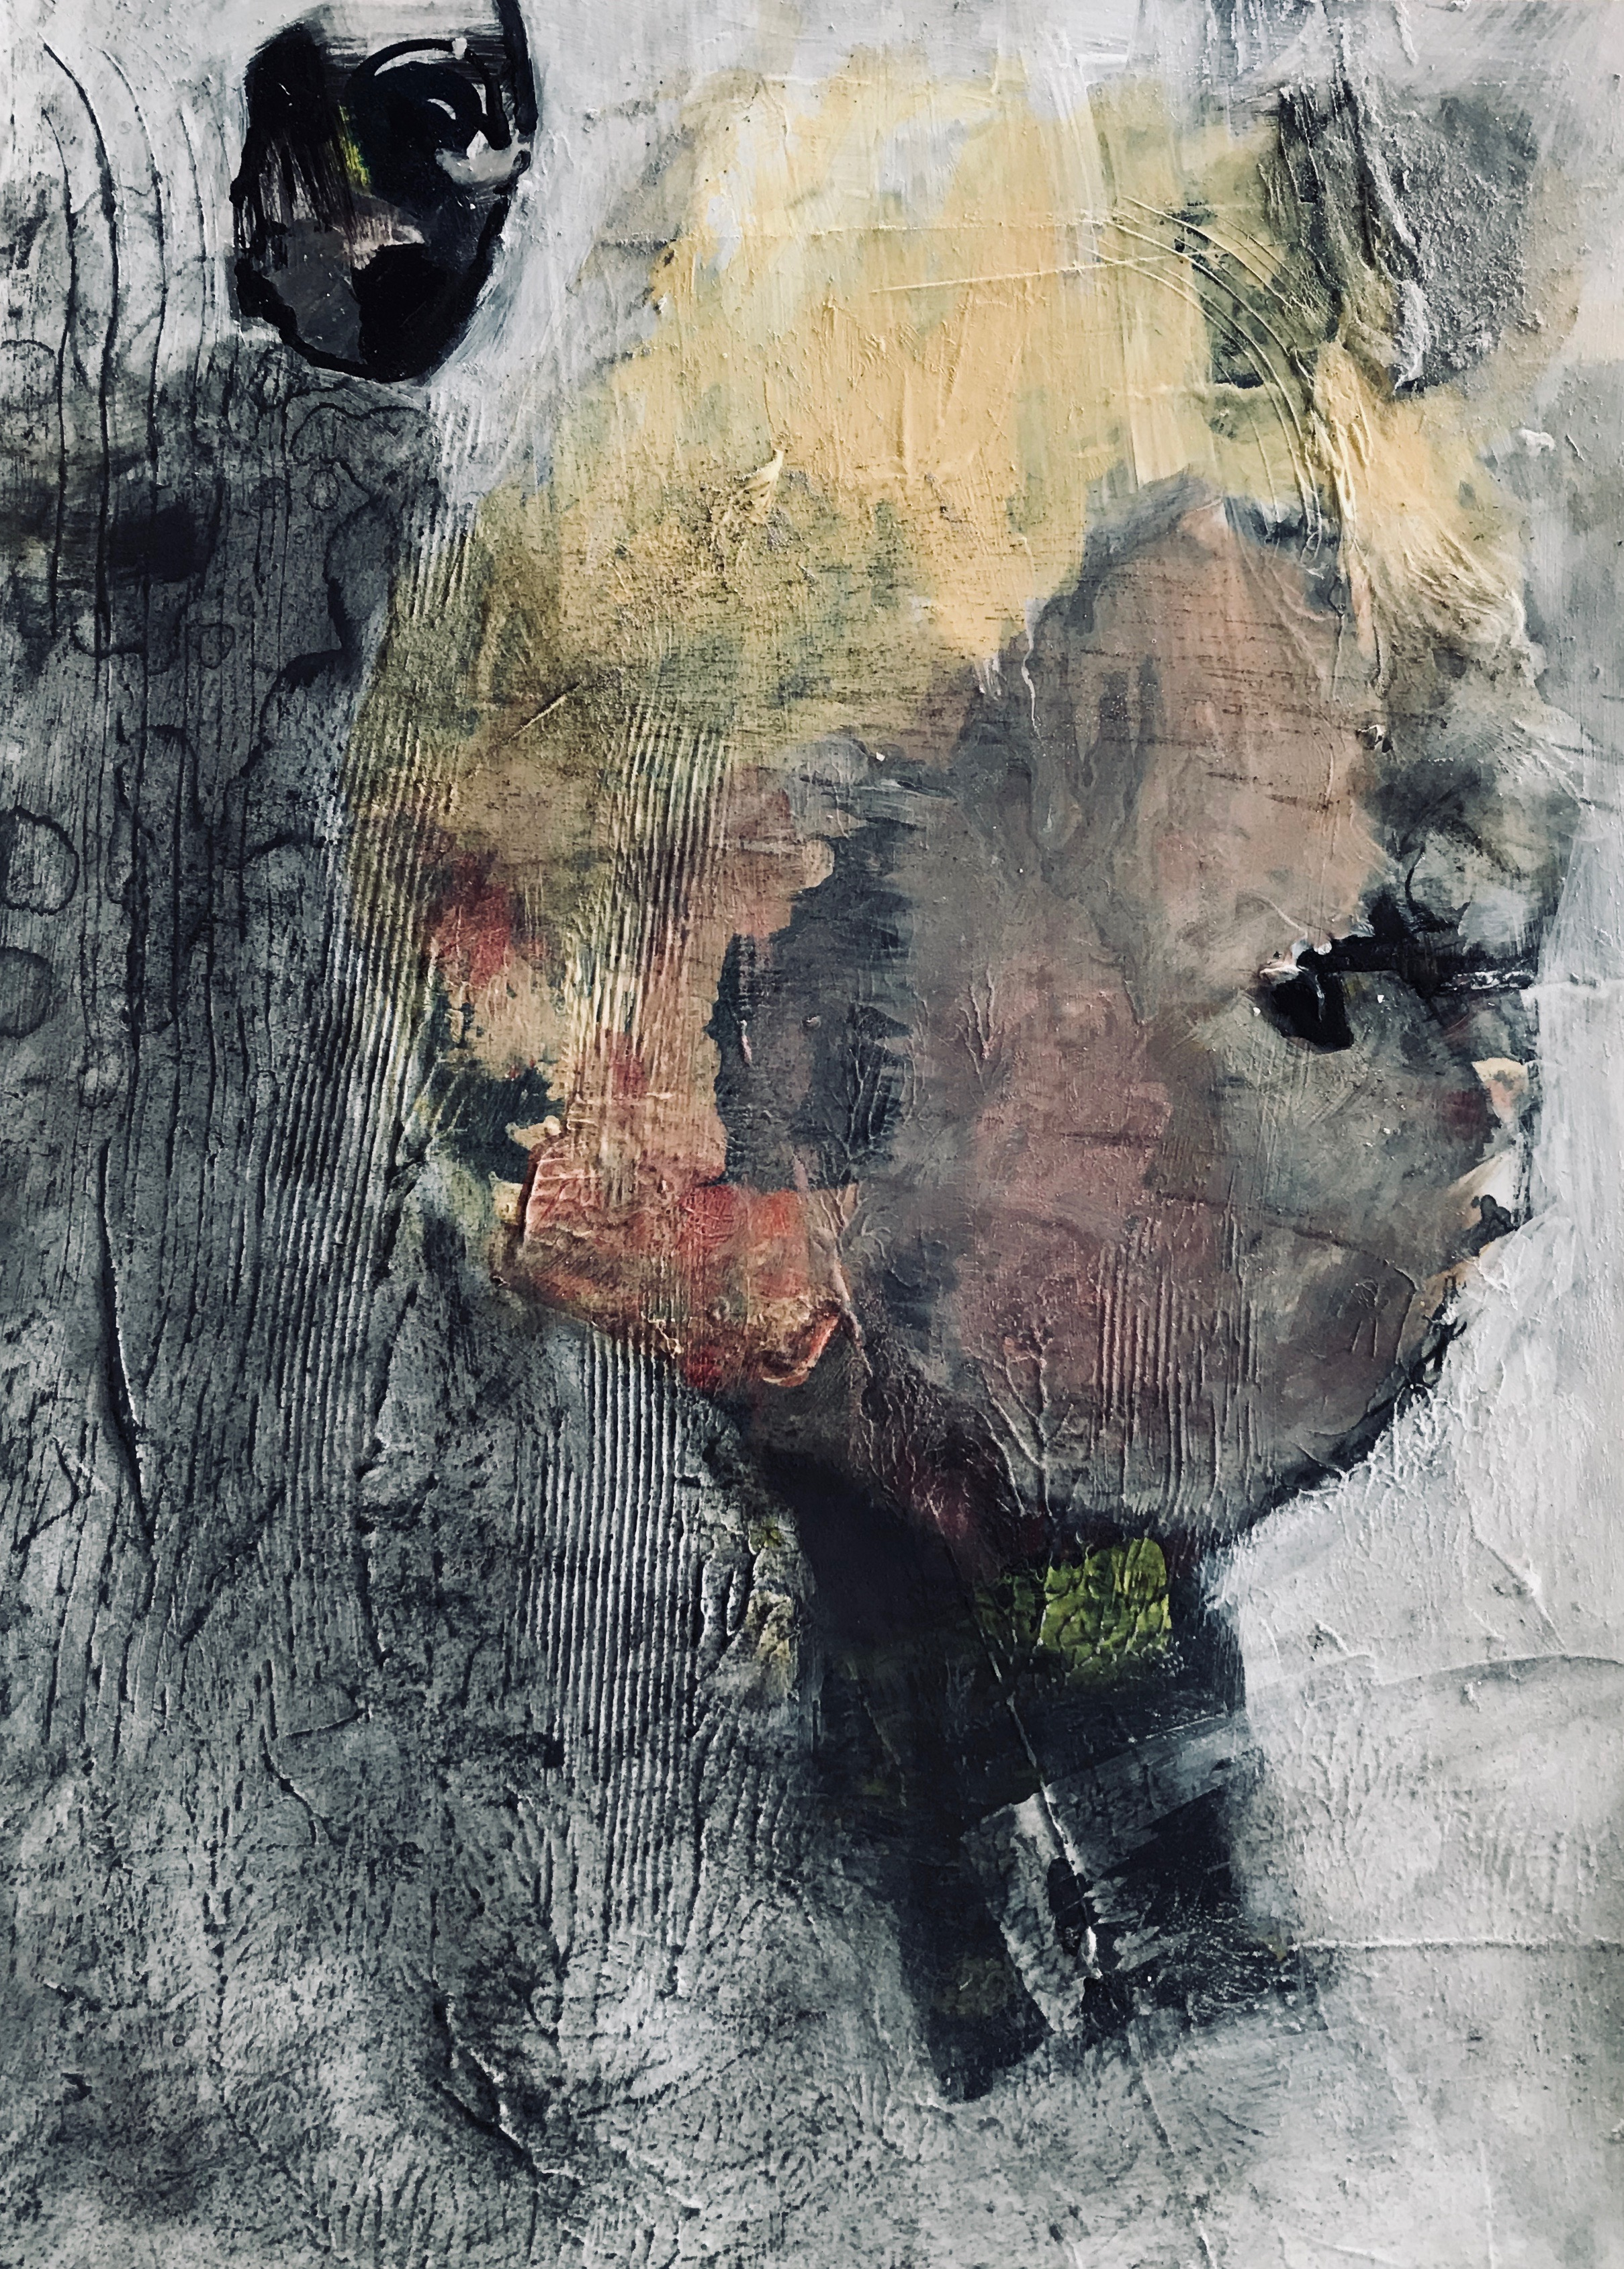 Beware lurking shadows, acrylic mixed media, 29.7x42 cm